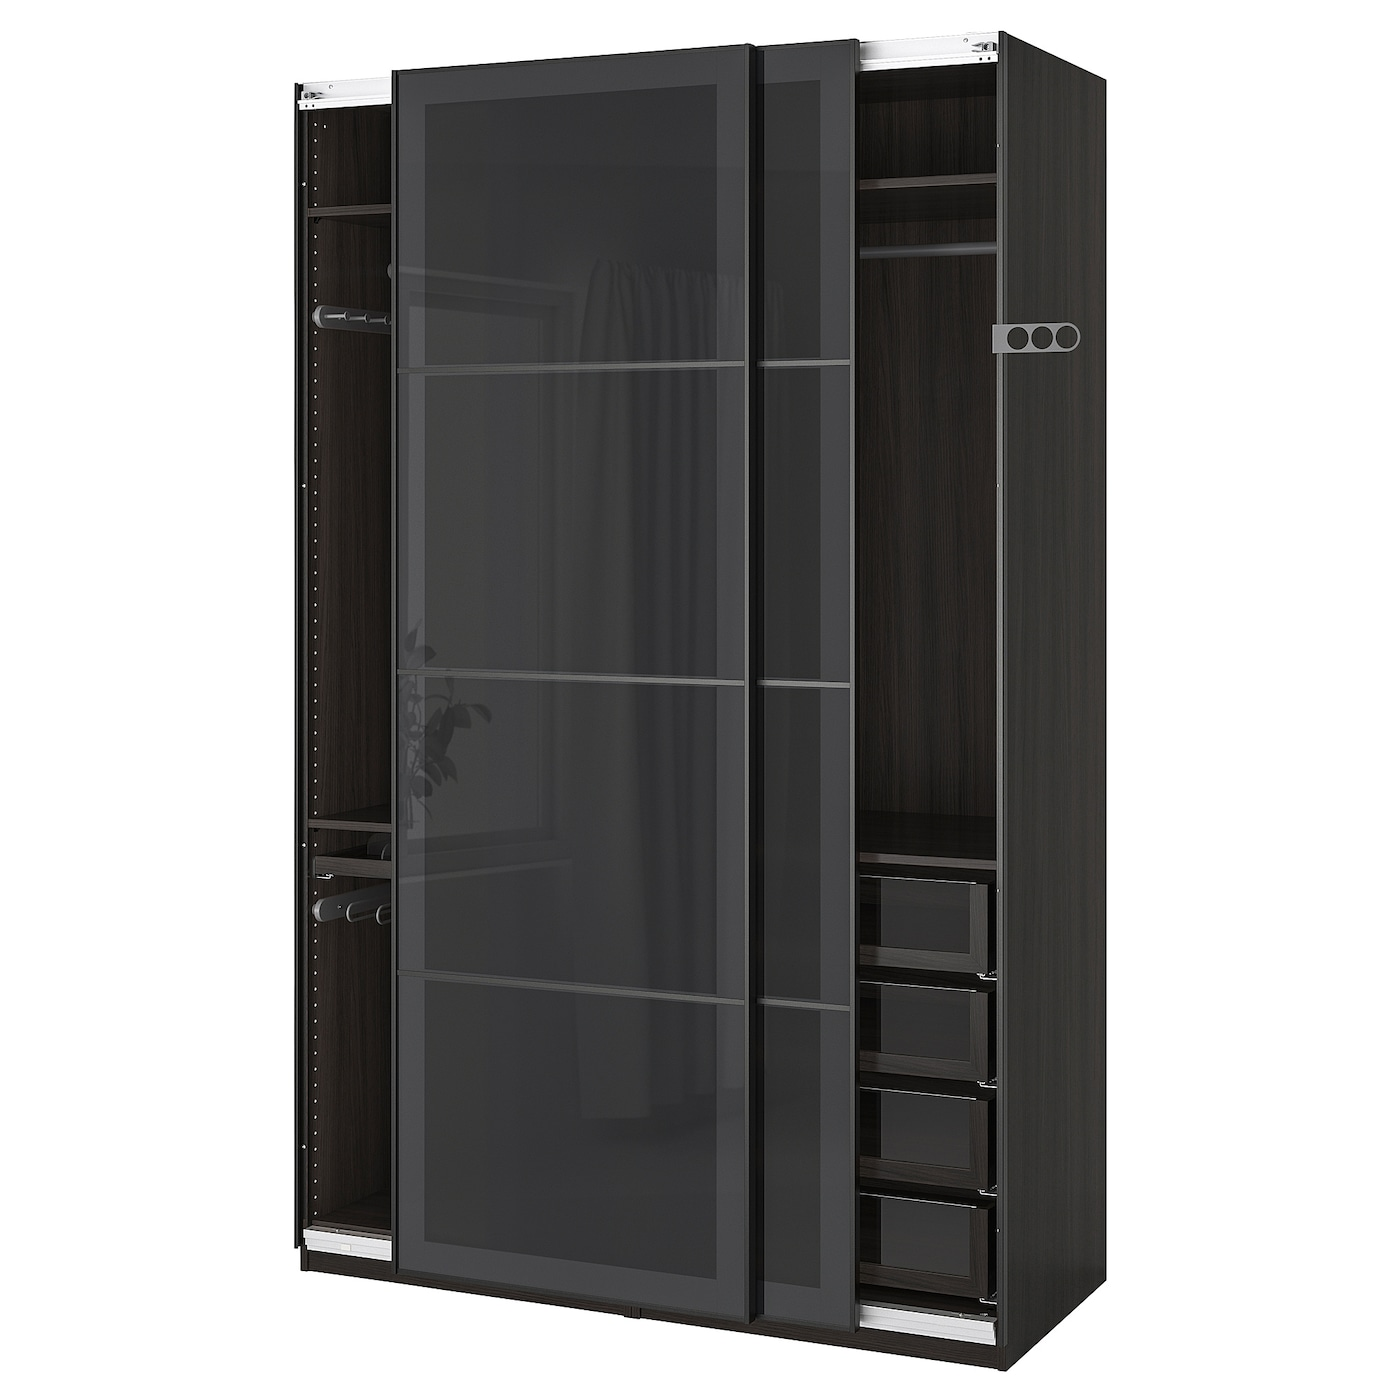 IKEA PAX Szafa, czarnybrąz, Uggdal szare szkło, 150x66x236 cm